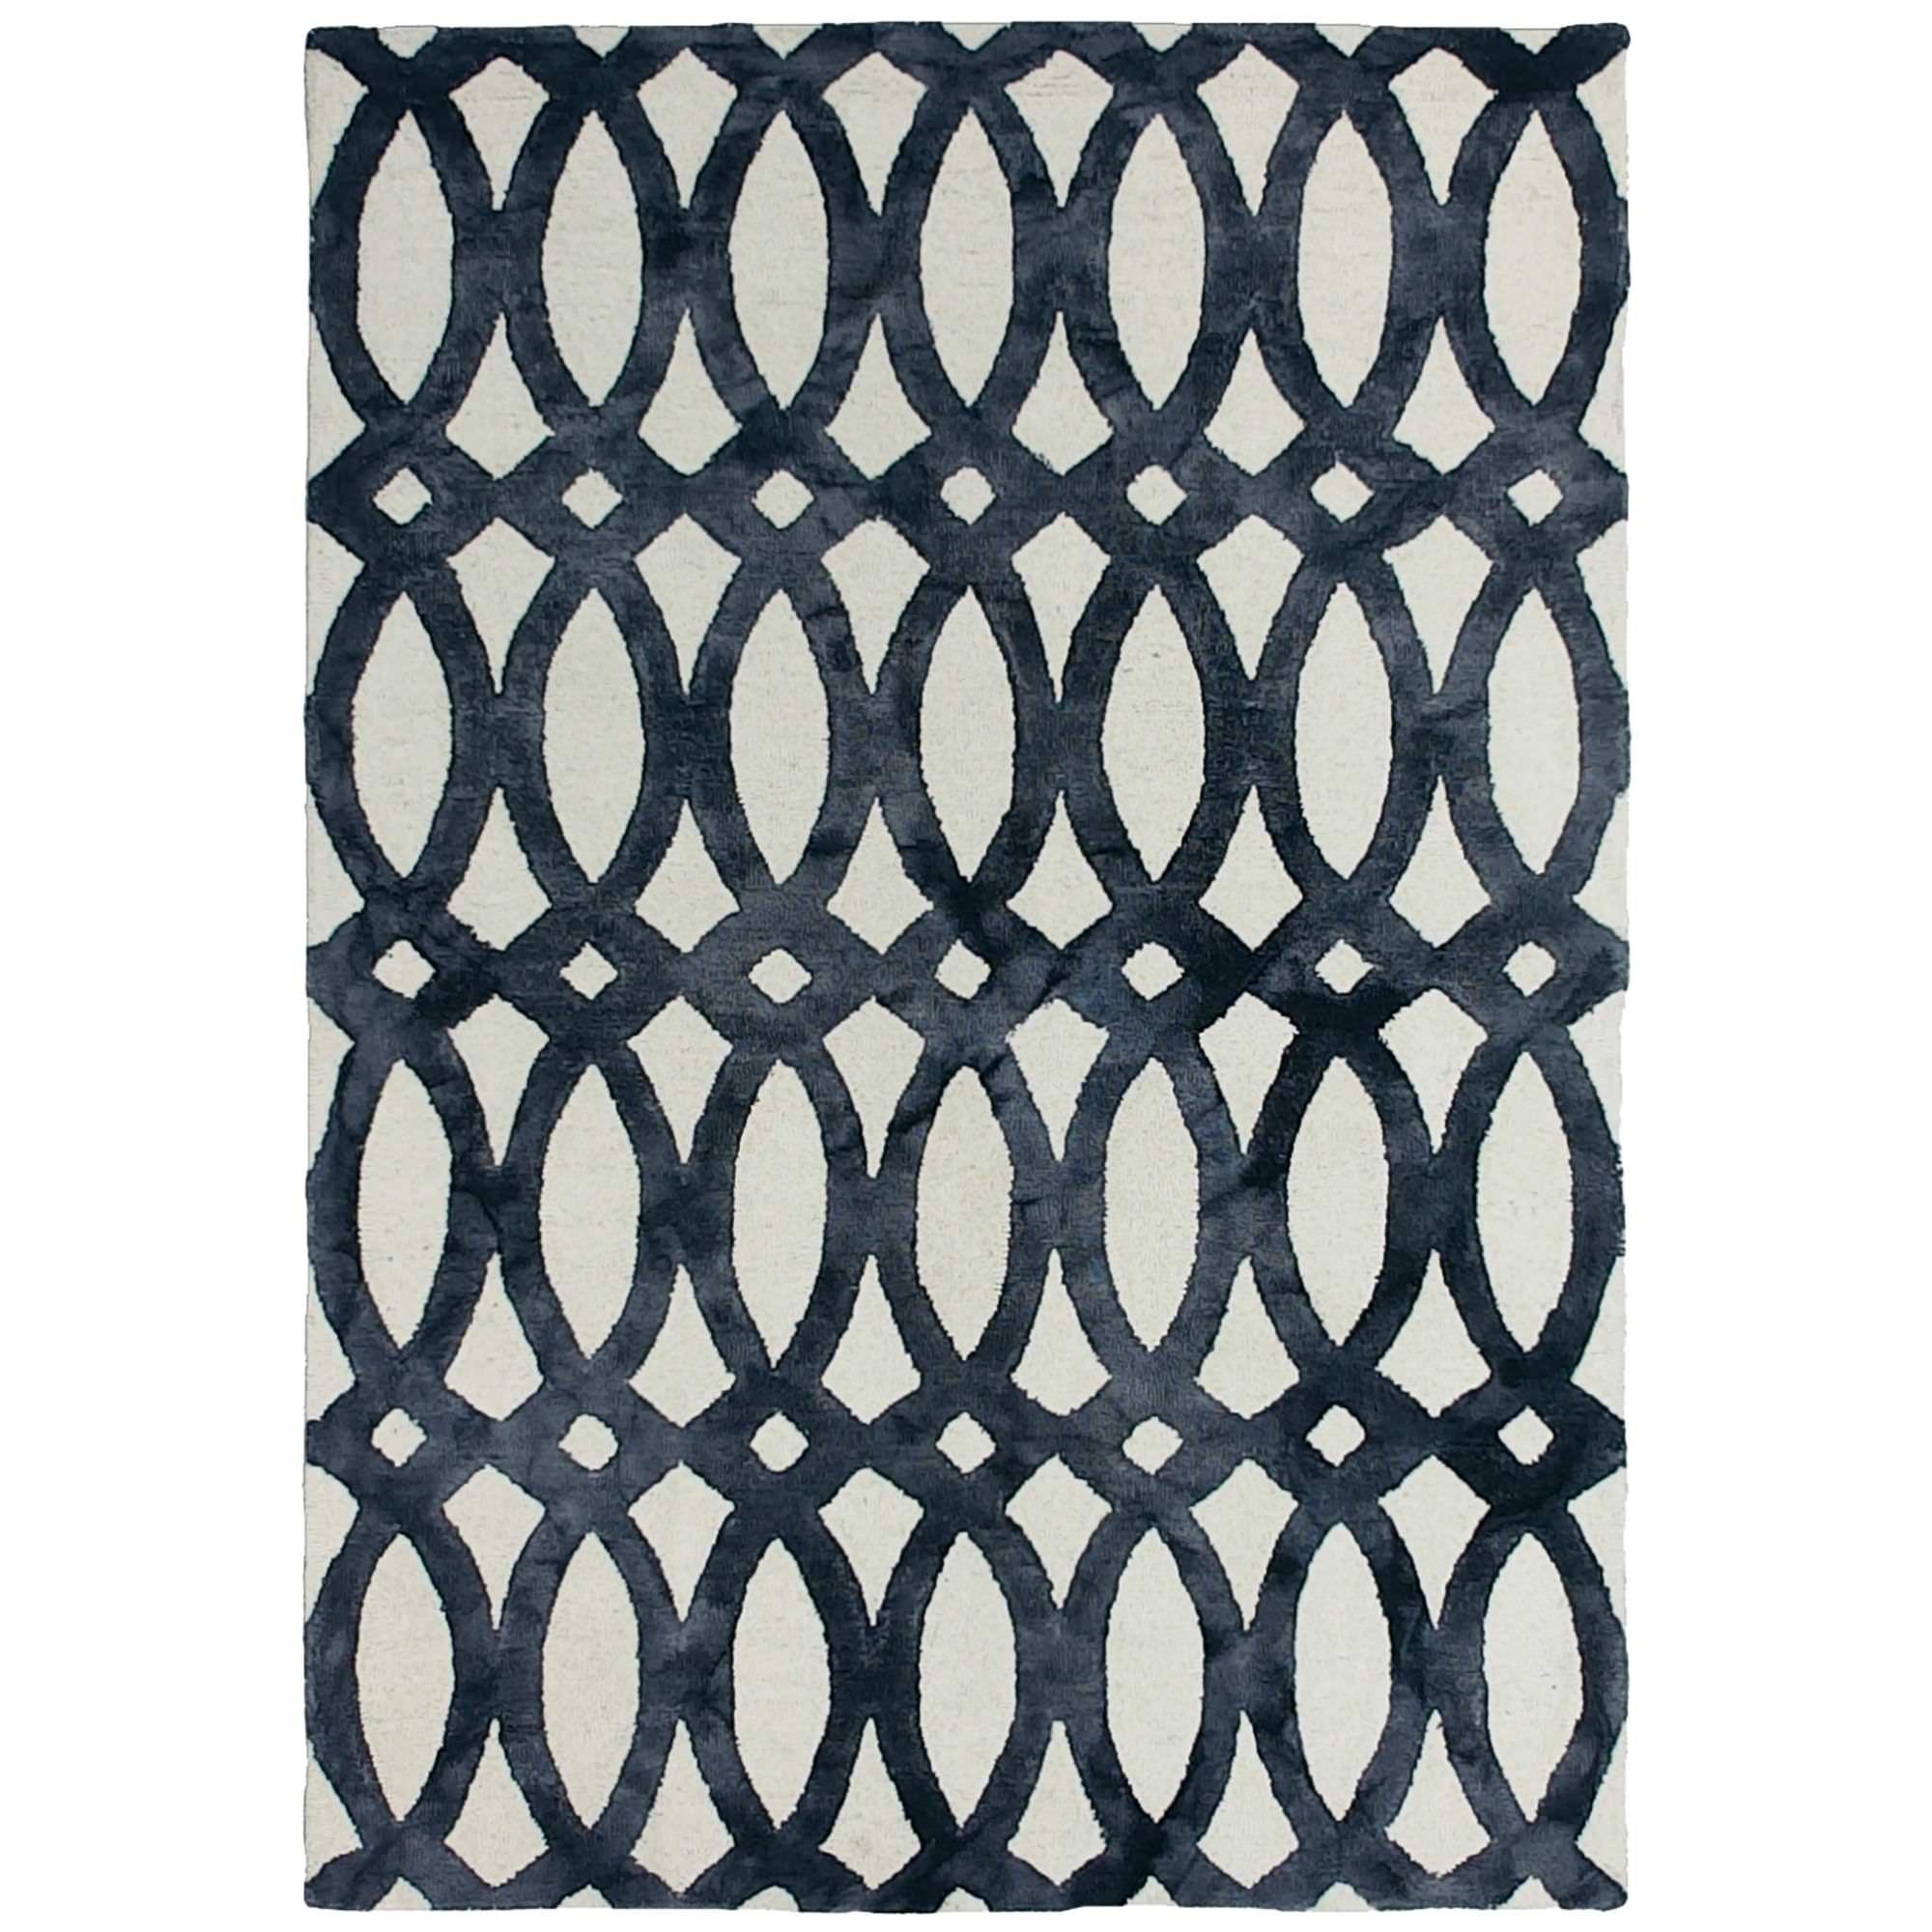 Dip Dye Hand Tufted Wool Rug, 200x300cm, Charcoal